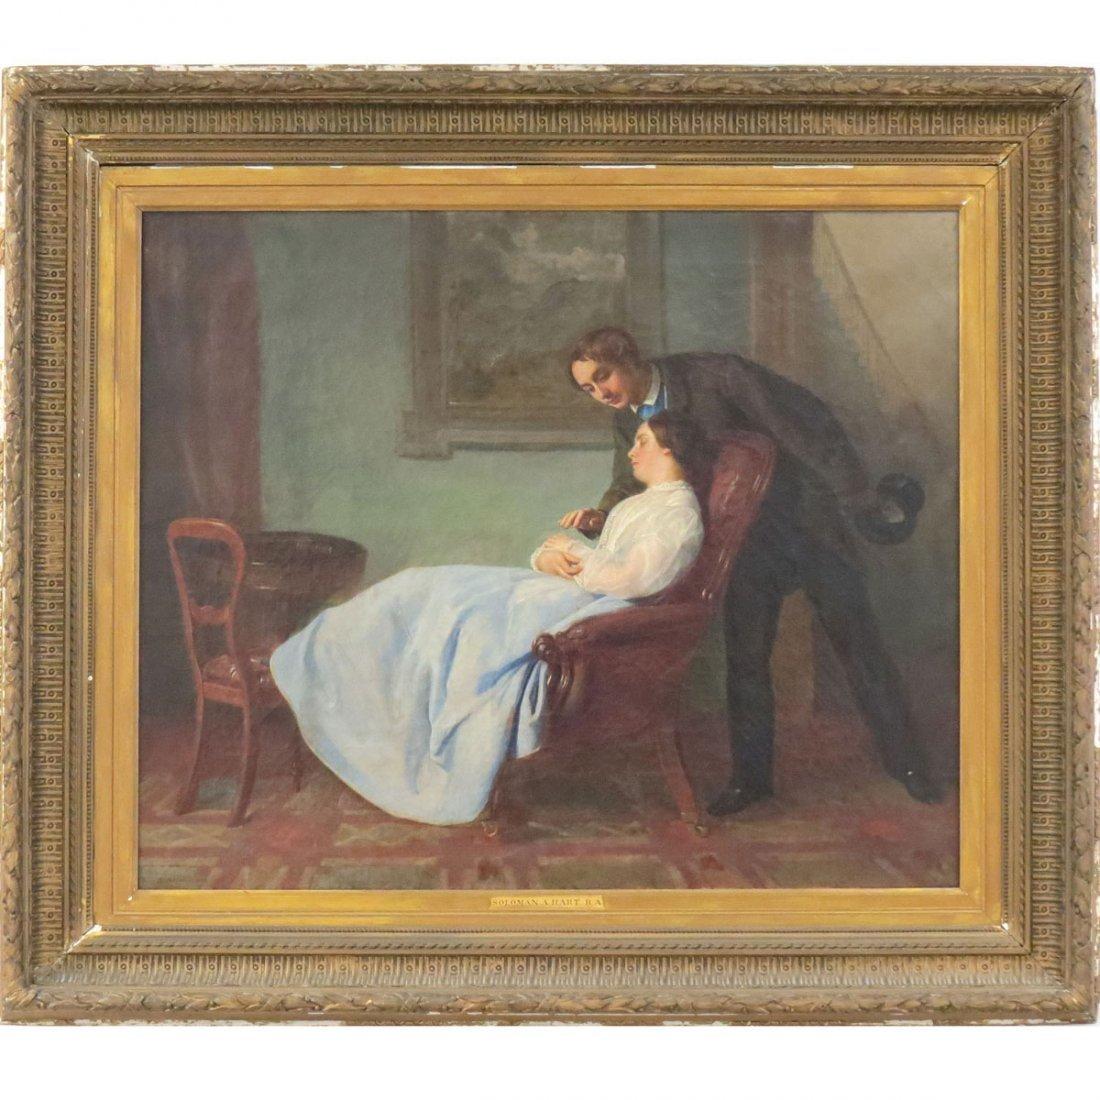 SOLOMON ALEXANDER HART (BRITISH 1806-1881), OIL